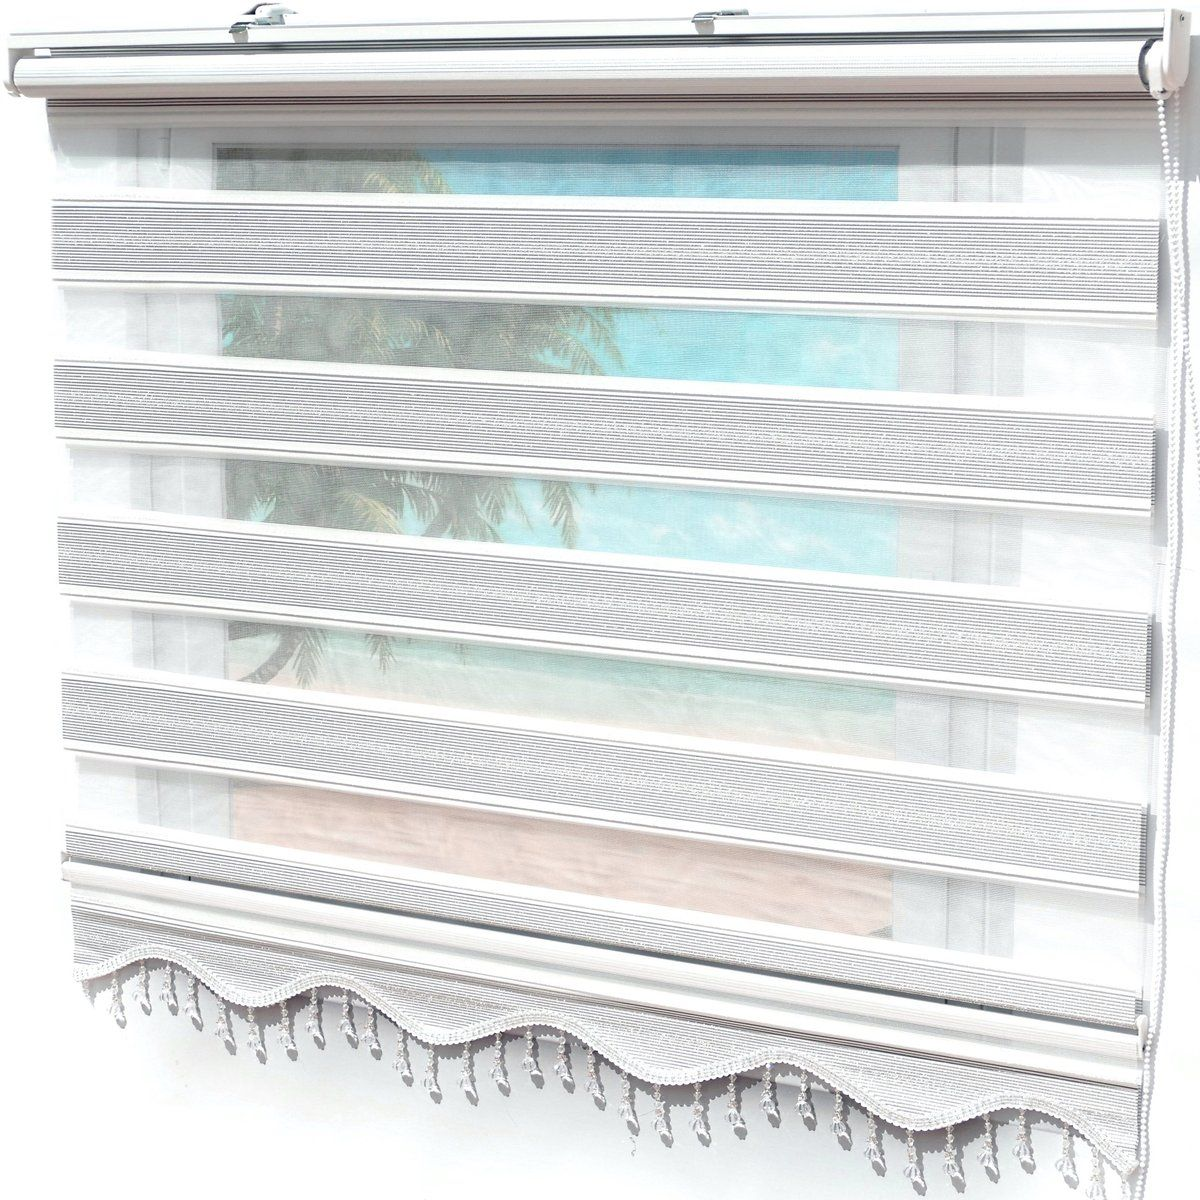 Doppelrollo Klemmfix Duorollo Zebra Perde Blickdicht Grau Silber Brillant Gardinen In 2020 Teppich Design Fensterrollo Blickdicht